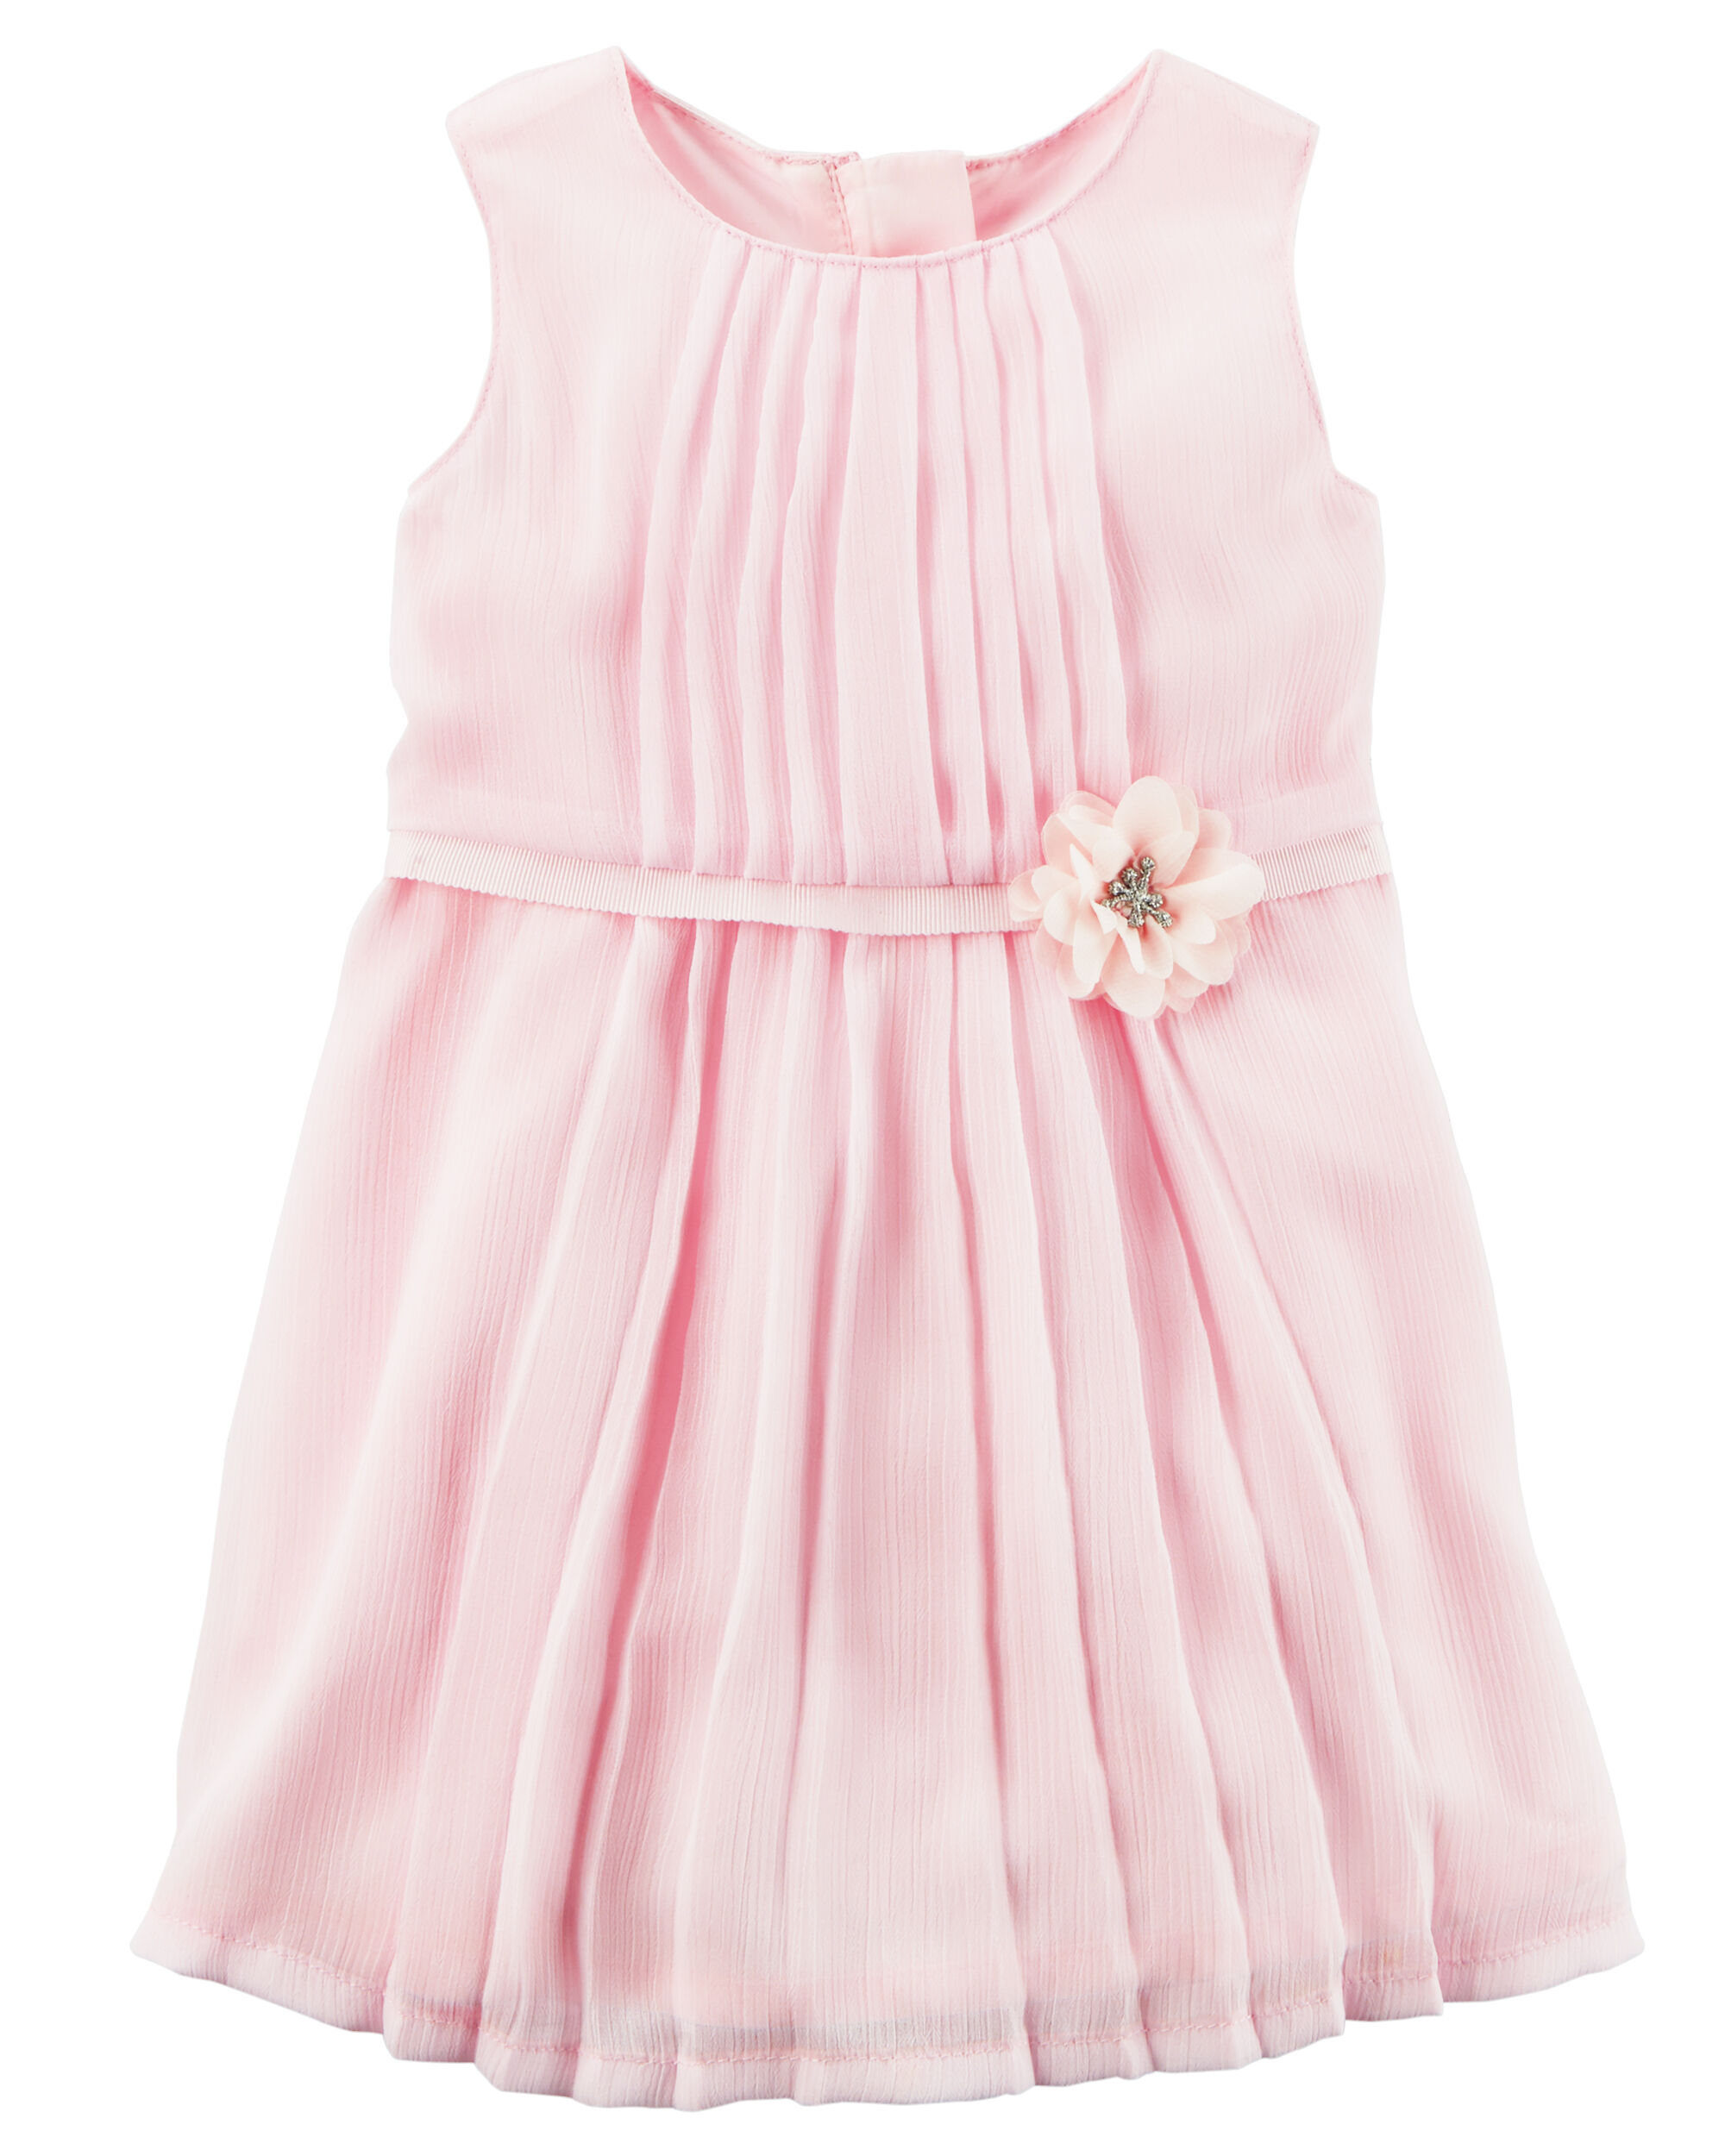 Baby Girl Christmas Dresses & Outfits